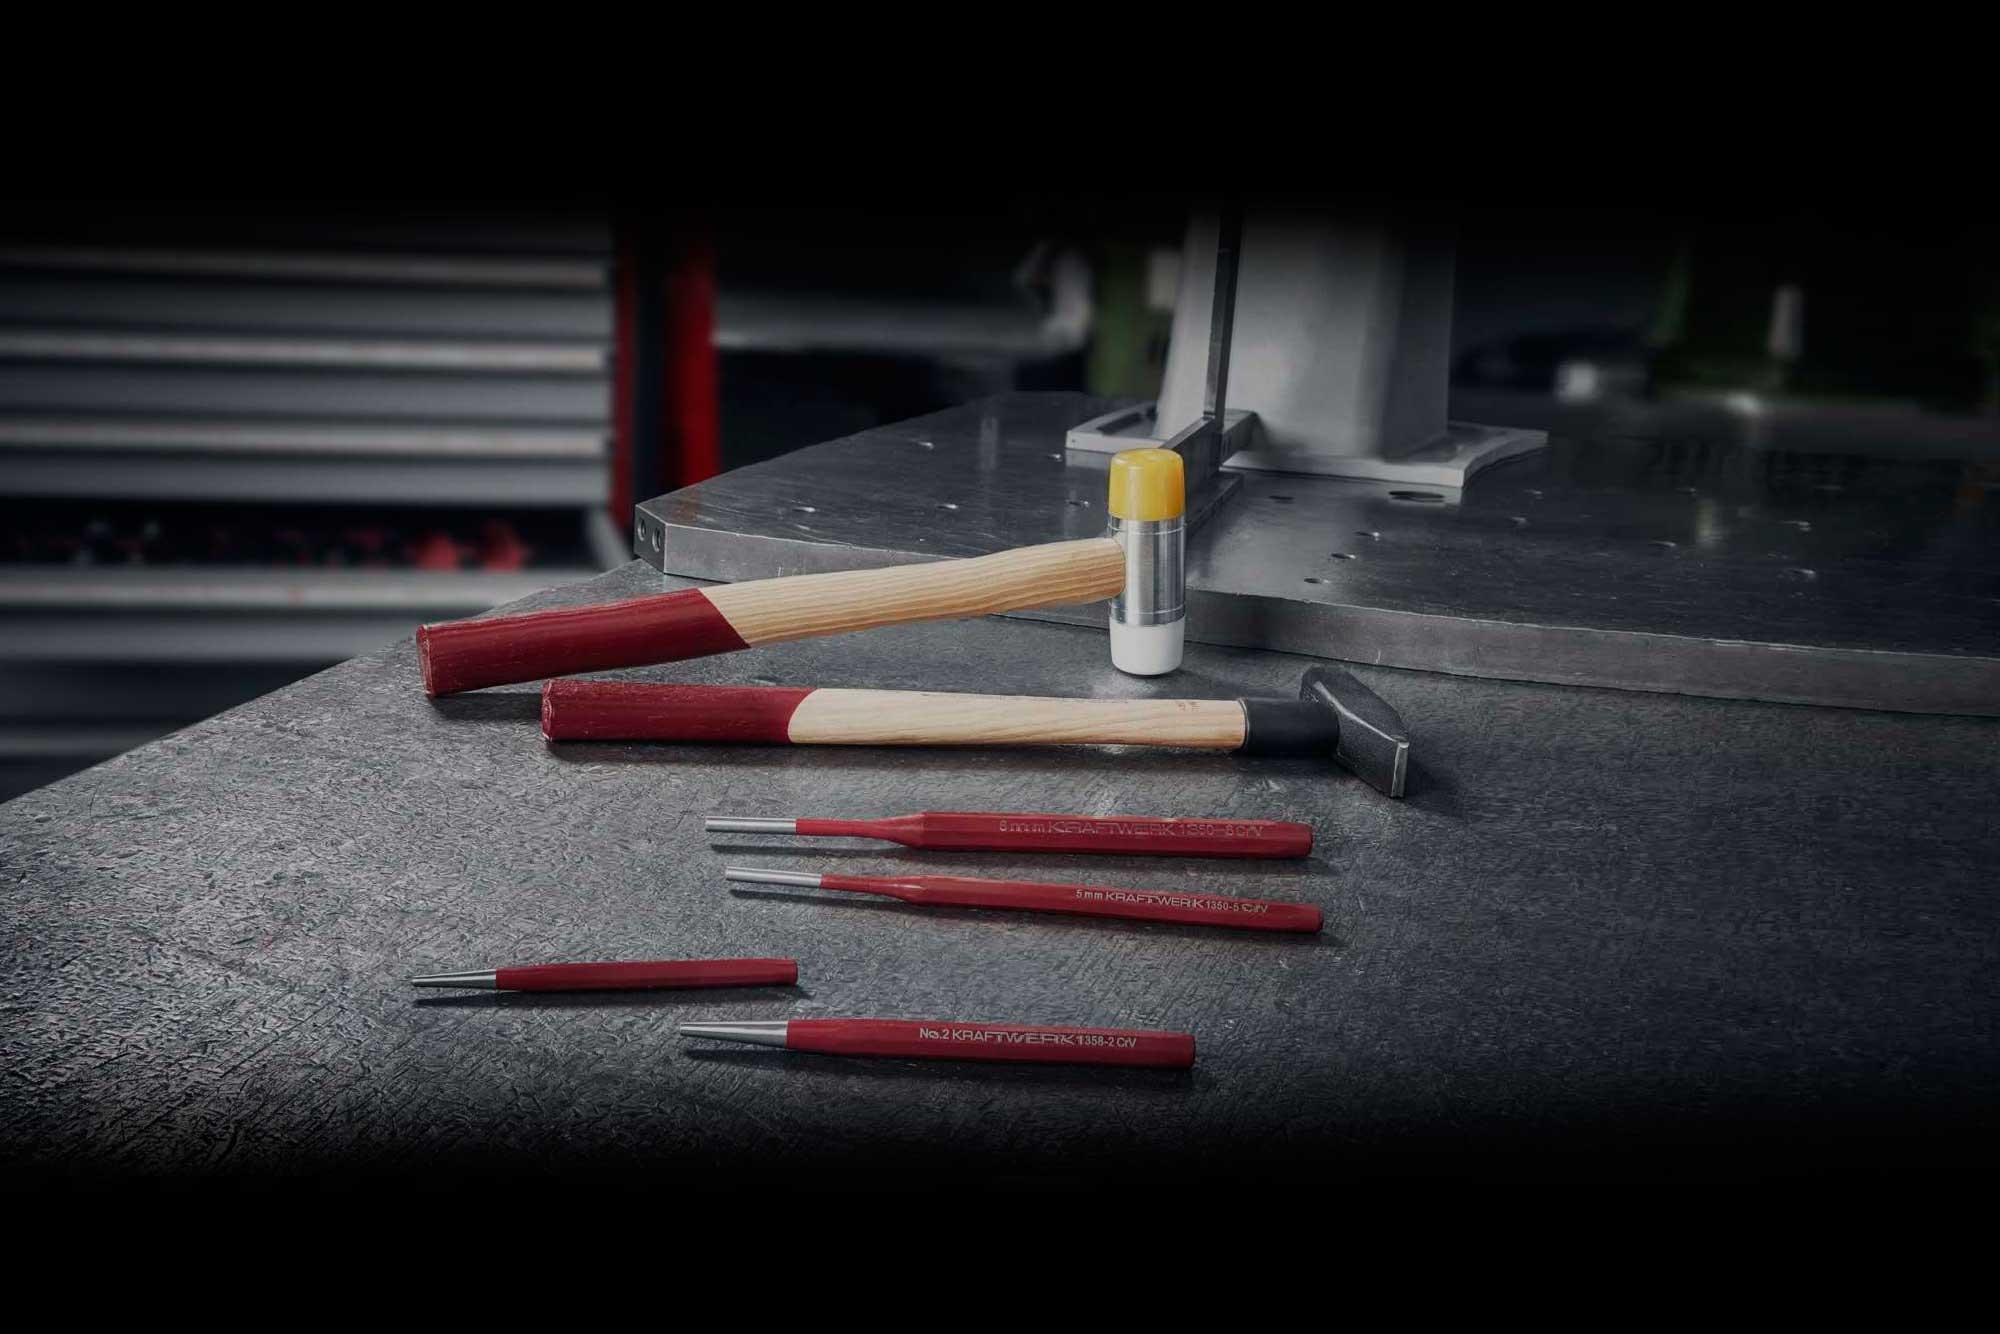 bg tienda better herramientas tools4us_01